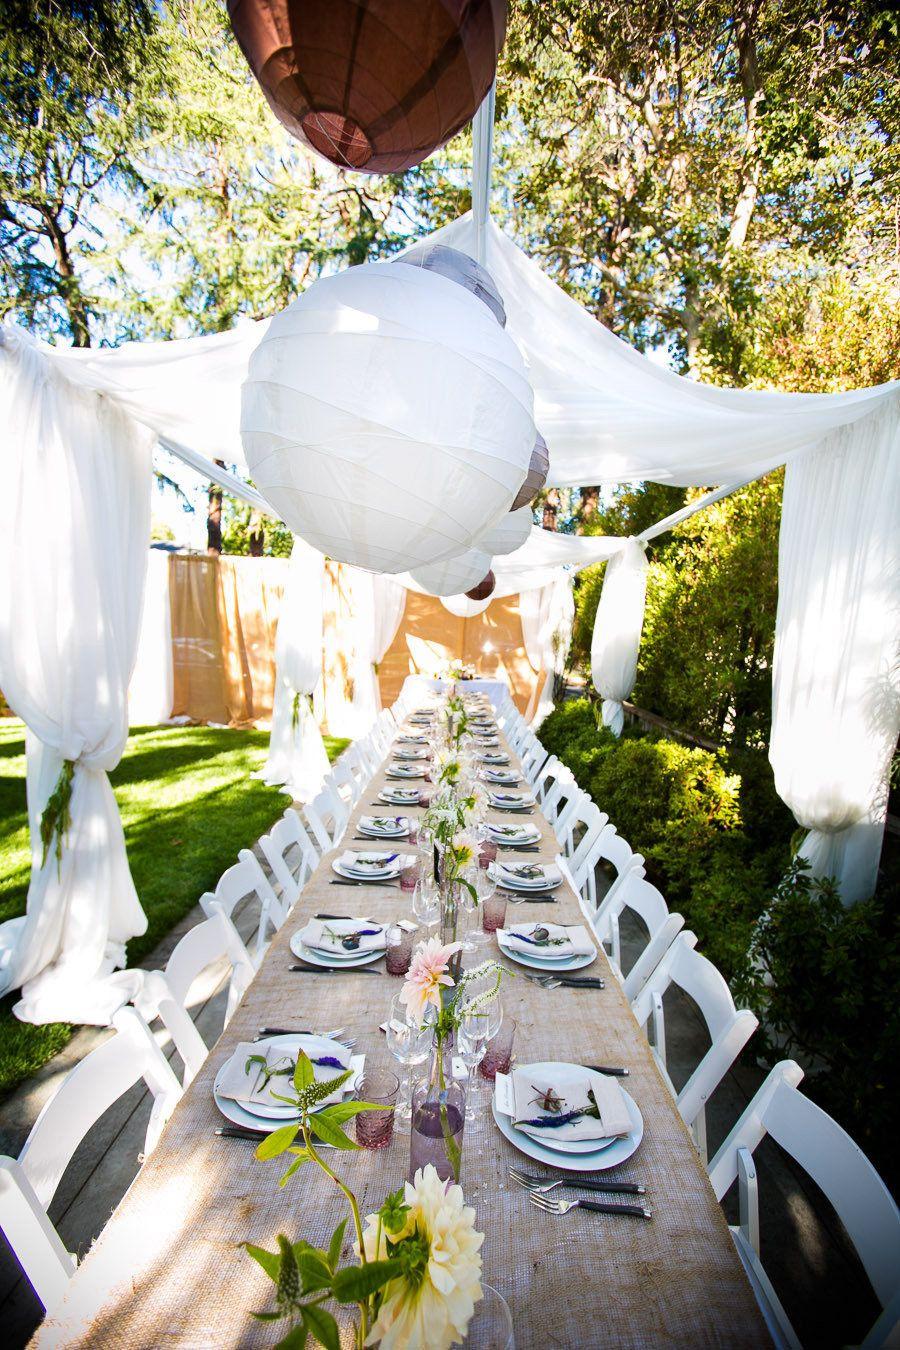 DIY Studio City Wedding from Callaway Gable  Read more - http://www.stylemepretty.com/california-weddings/2013/08/20/diy-studio-city-wedding-from-callaway-gable/